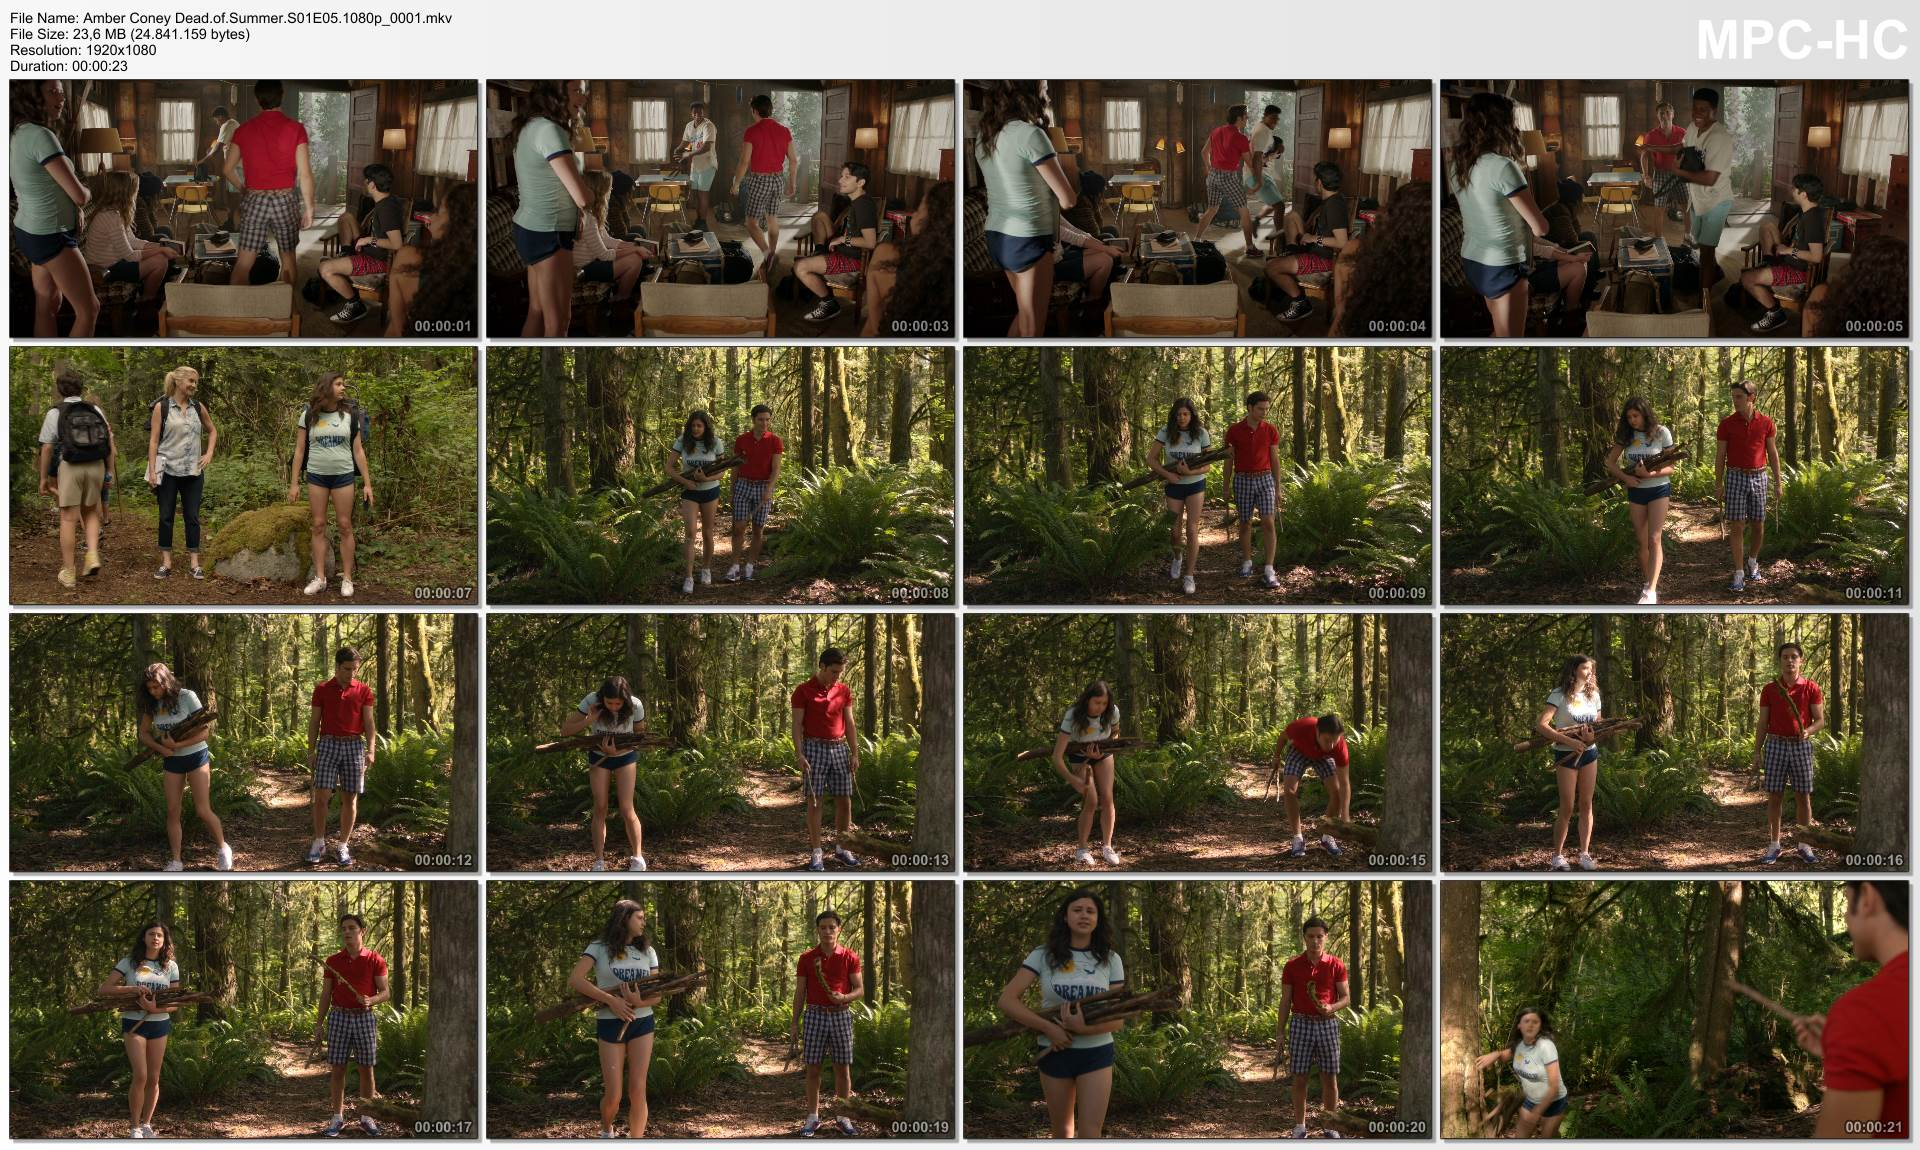 875354567_AmberConeyDead.of.Summer.S01E05.1080p_0001.mkv_thumbs_122_398lo.jpg